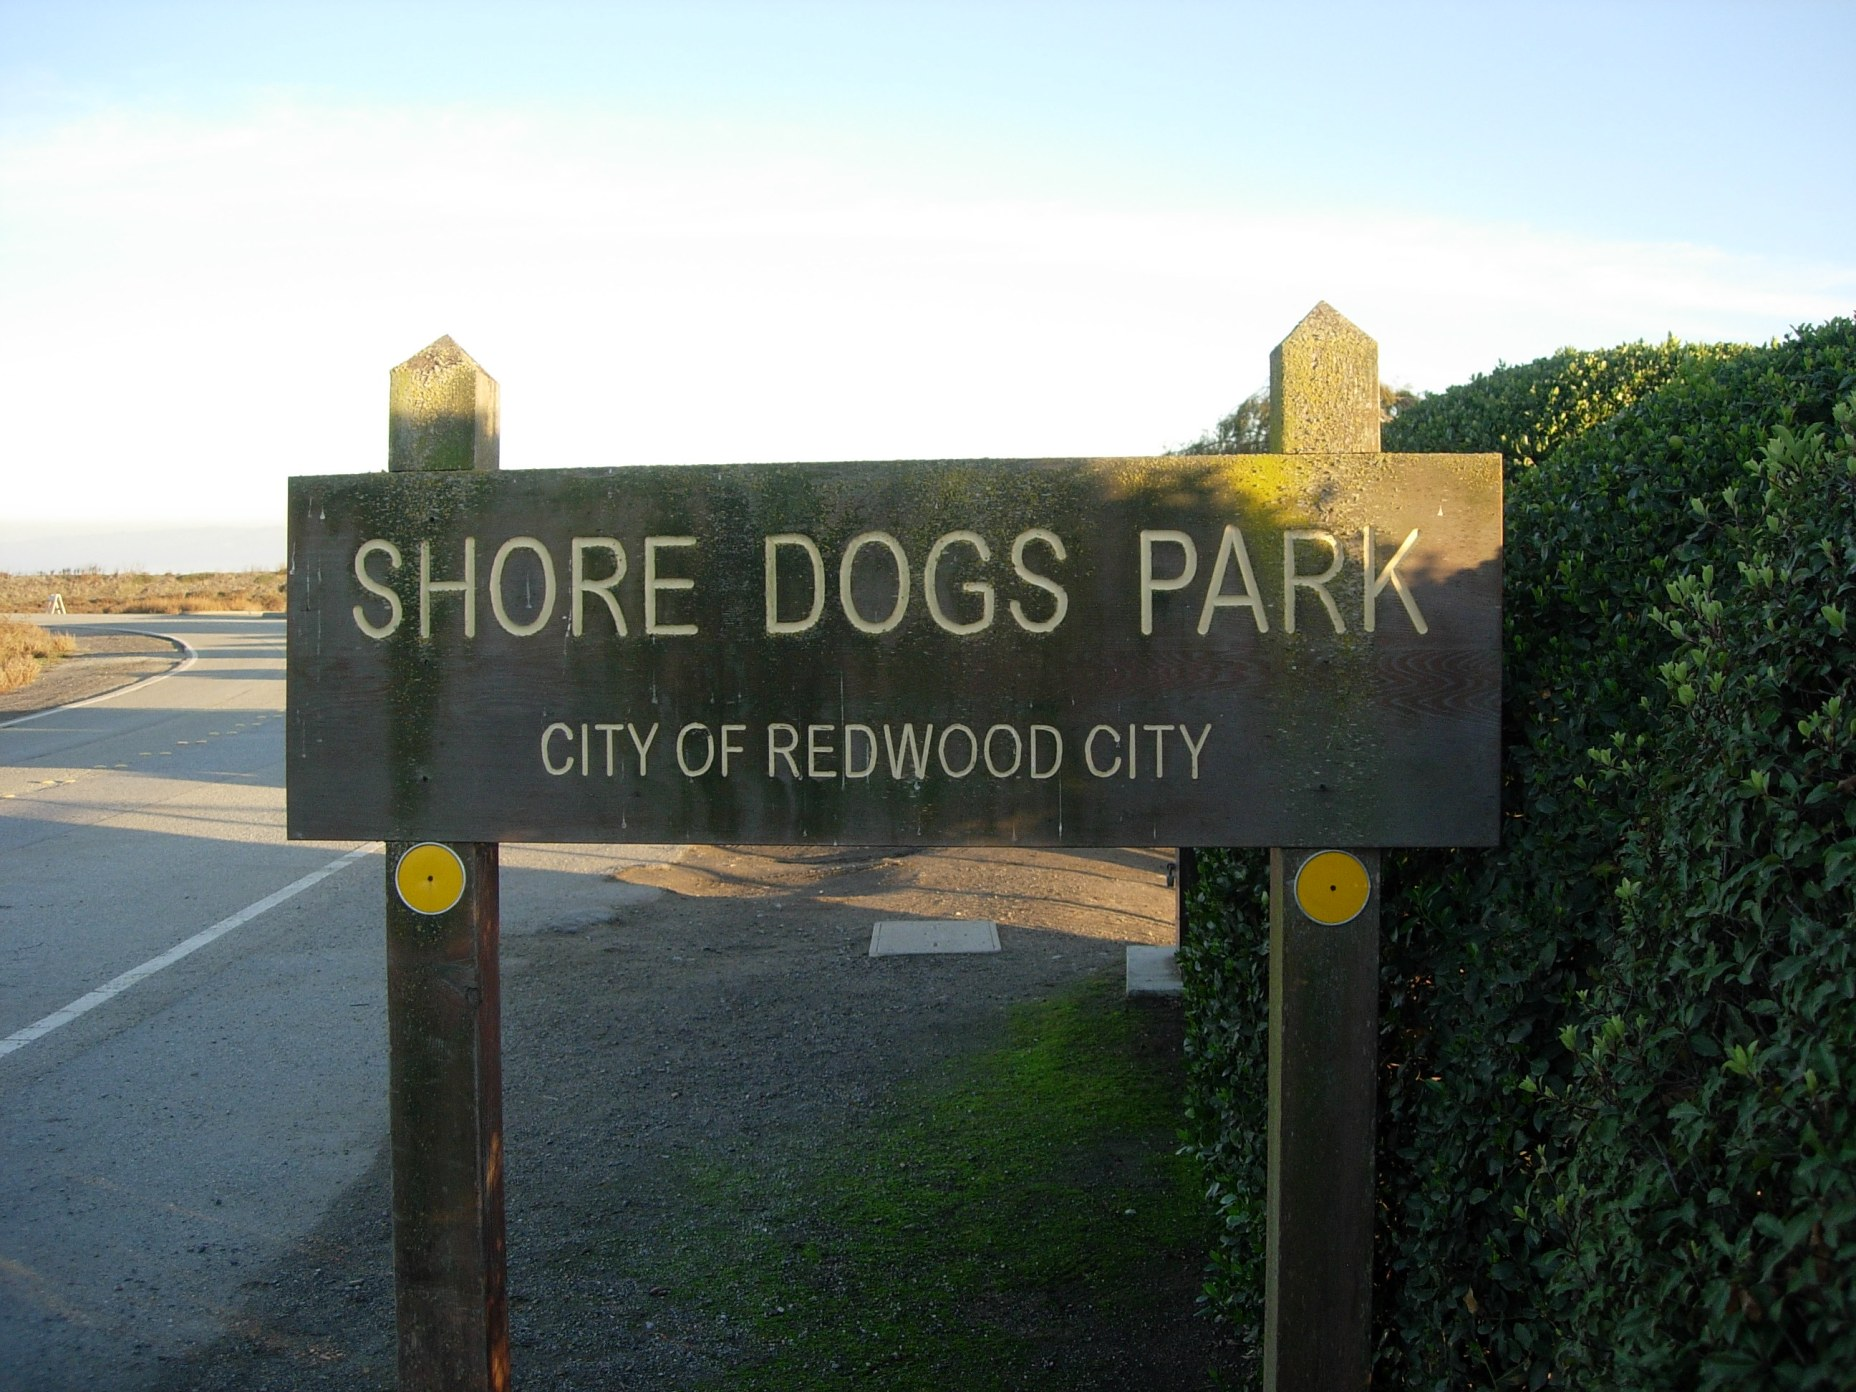 Shore DogsPark